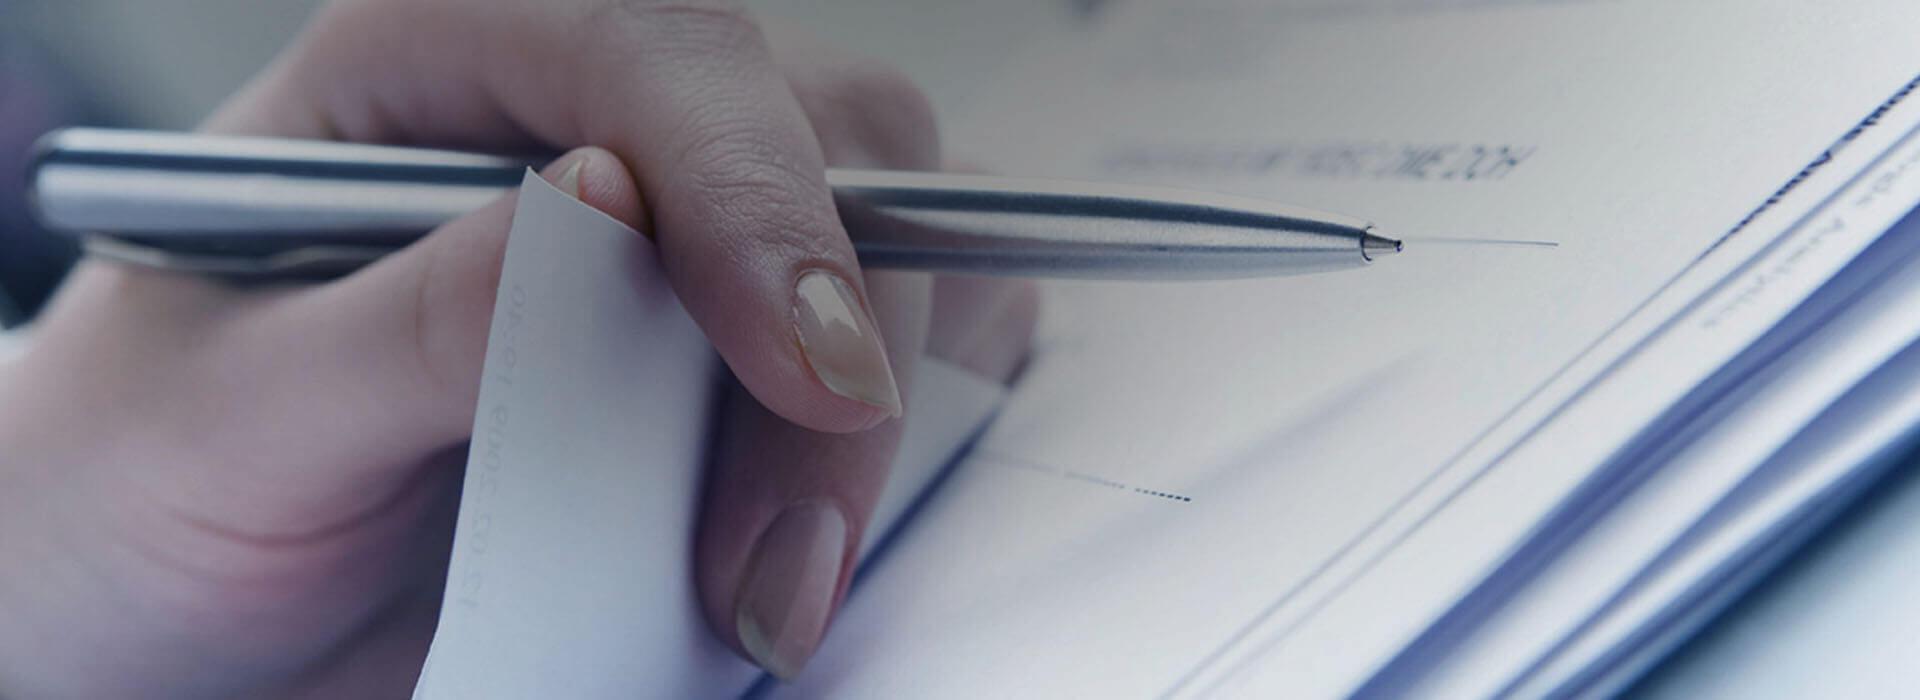 professional lesson plans for clients